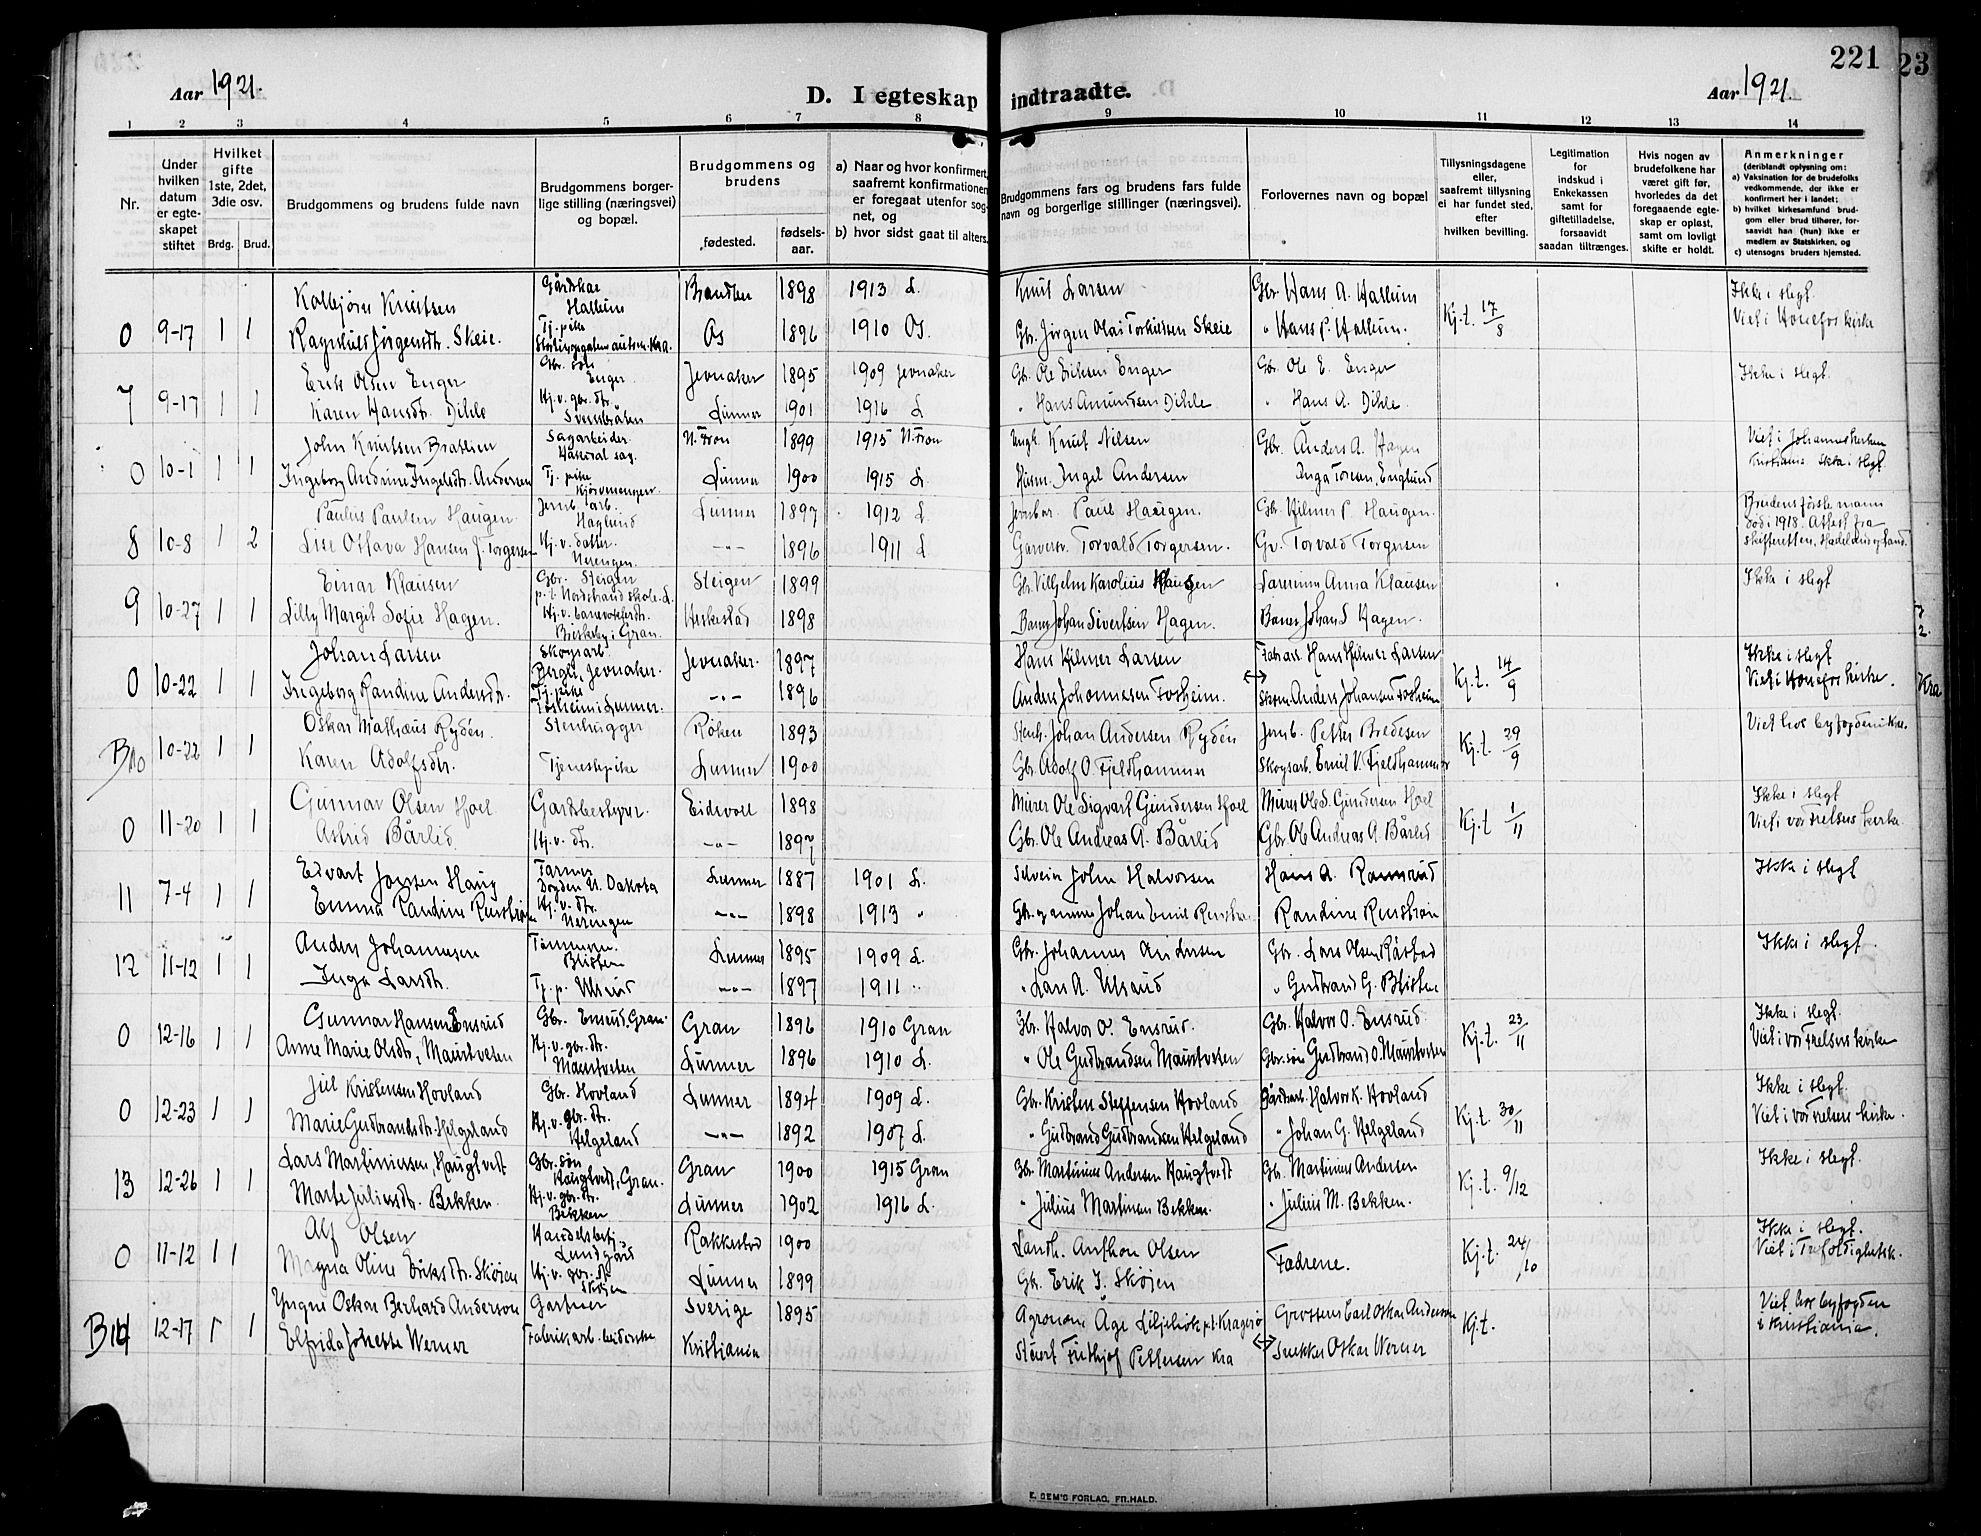 SAH, Lunner prestekontor, H/Ha/Hab/L0001: Klokkerbok nr. 1, 1909-1922, s. 221